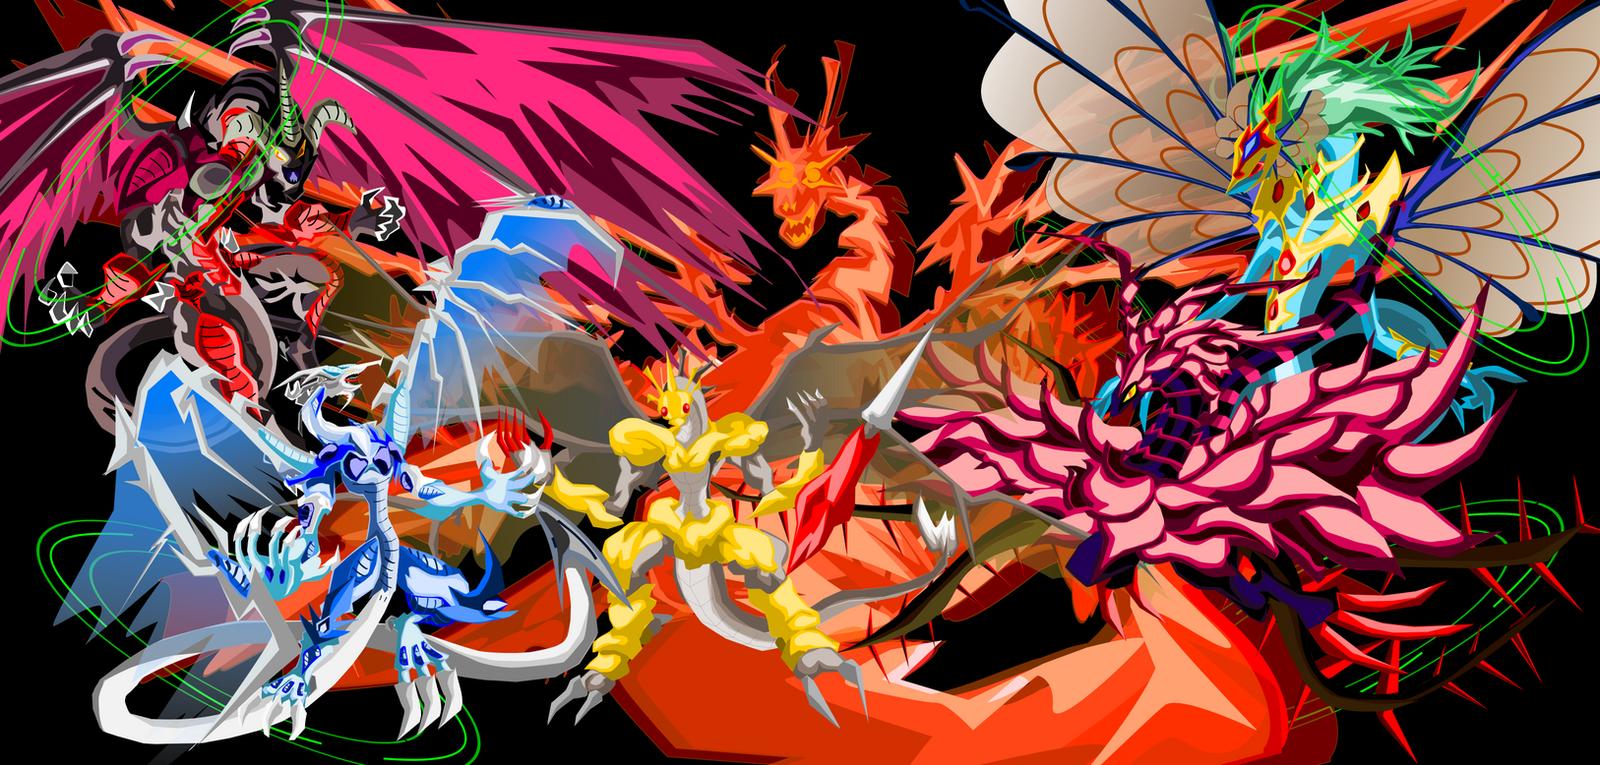 servants of the crimson dragon by juming5 on deviantart